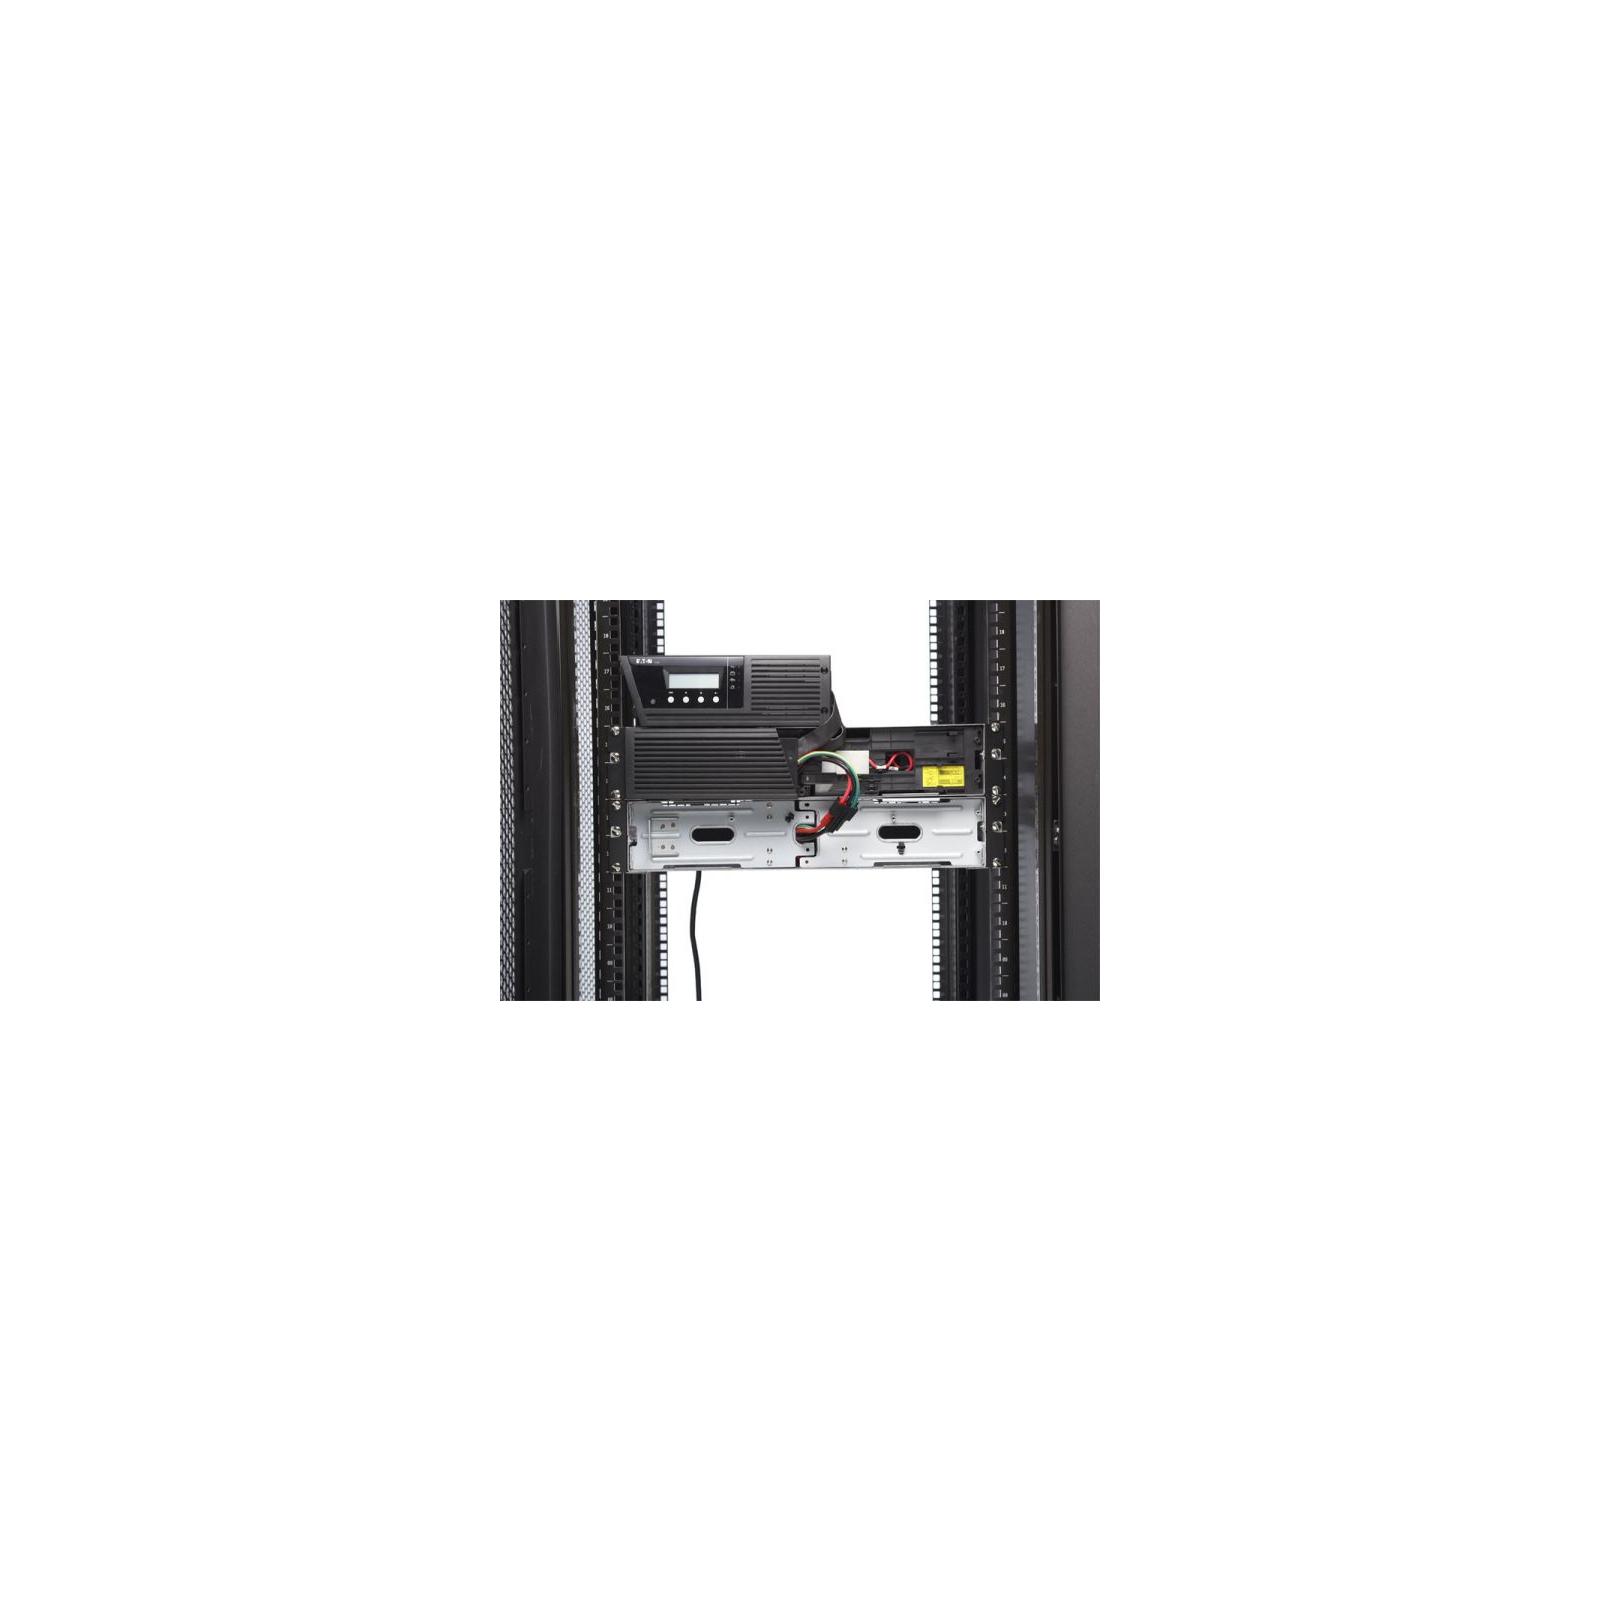 Батарея к ИБП Eaton 9130 1000VA RM (103006458-6591) изображение 3